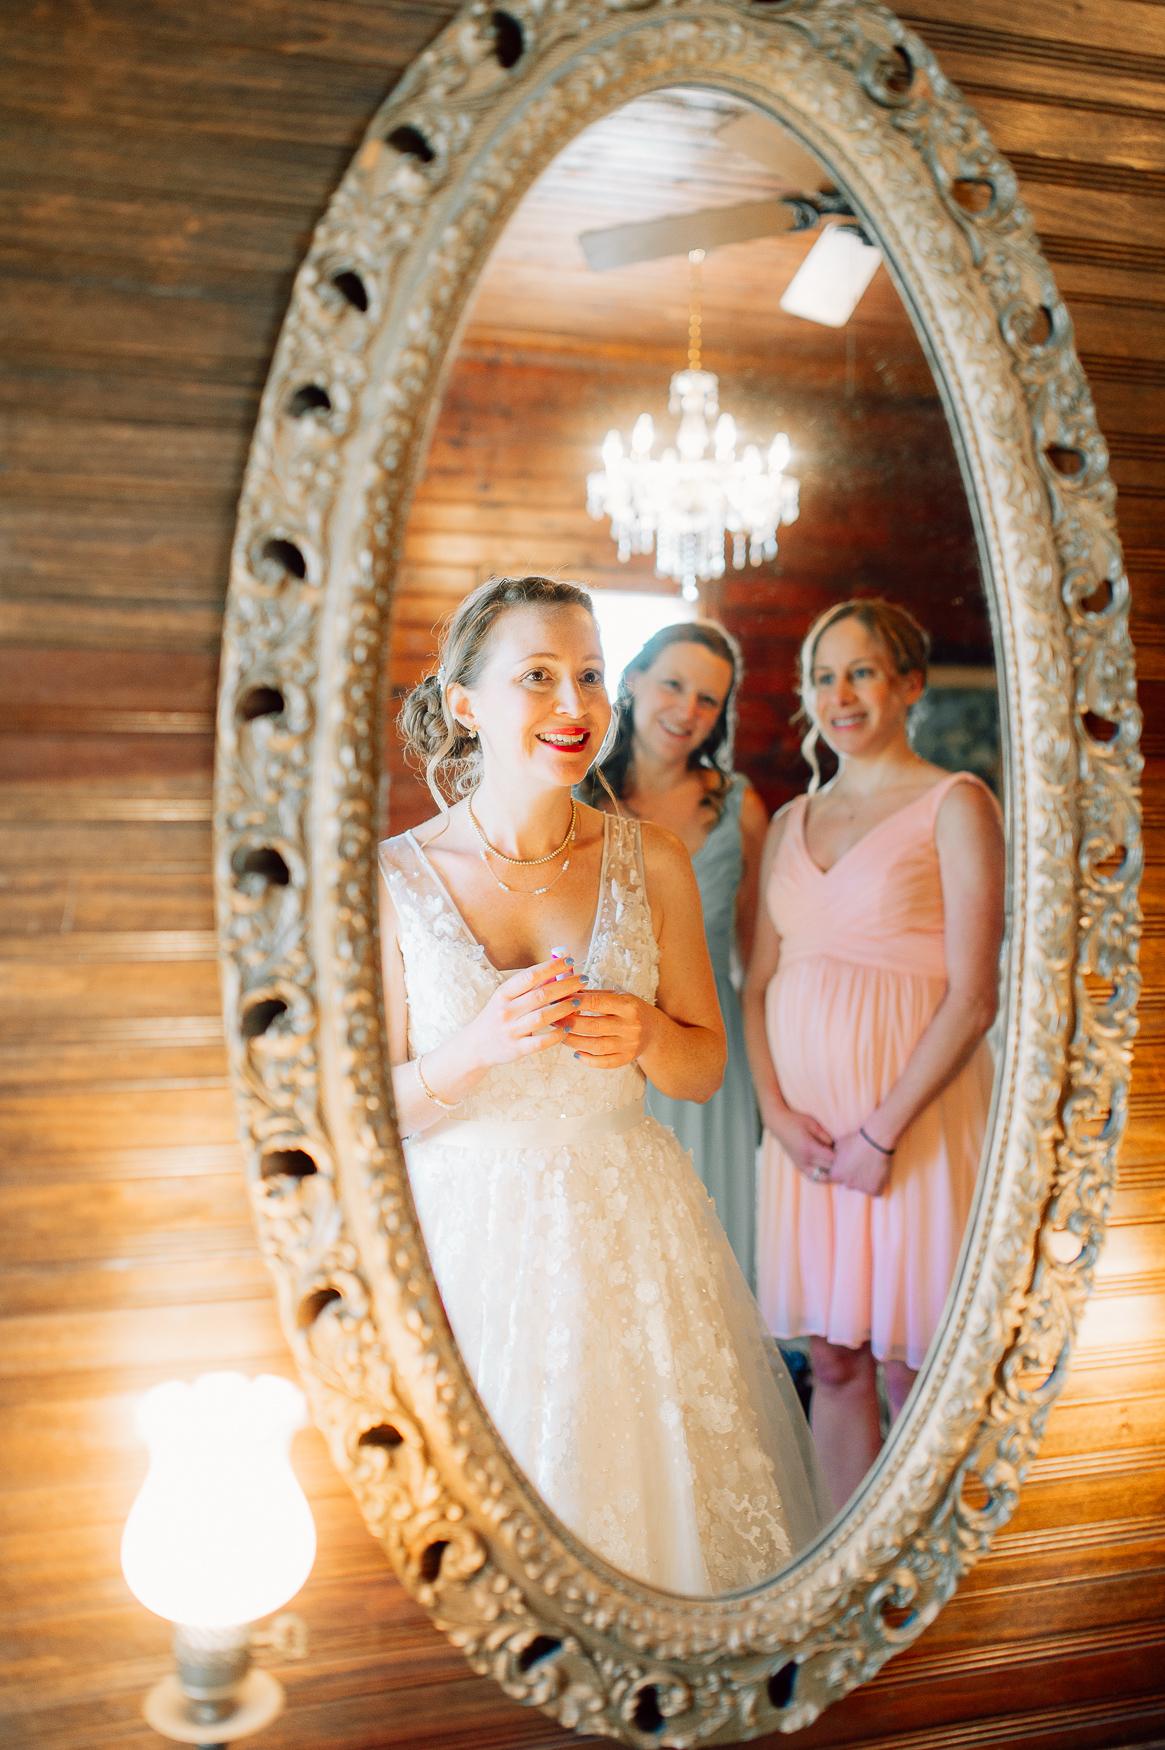 virginiawedding_theGlasgowFarm_rusticwedding_fredericksburg_youseephotography_CarolineDale (15).jpg